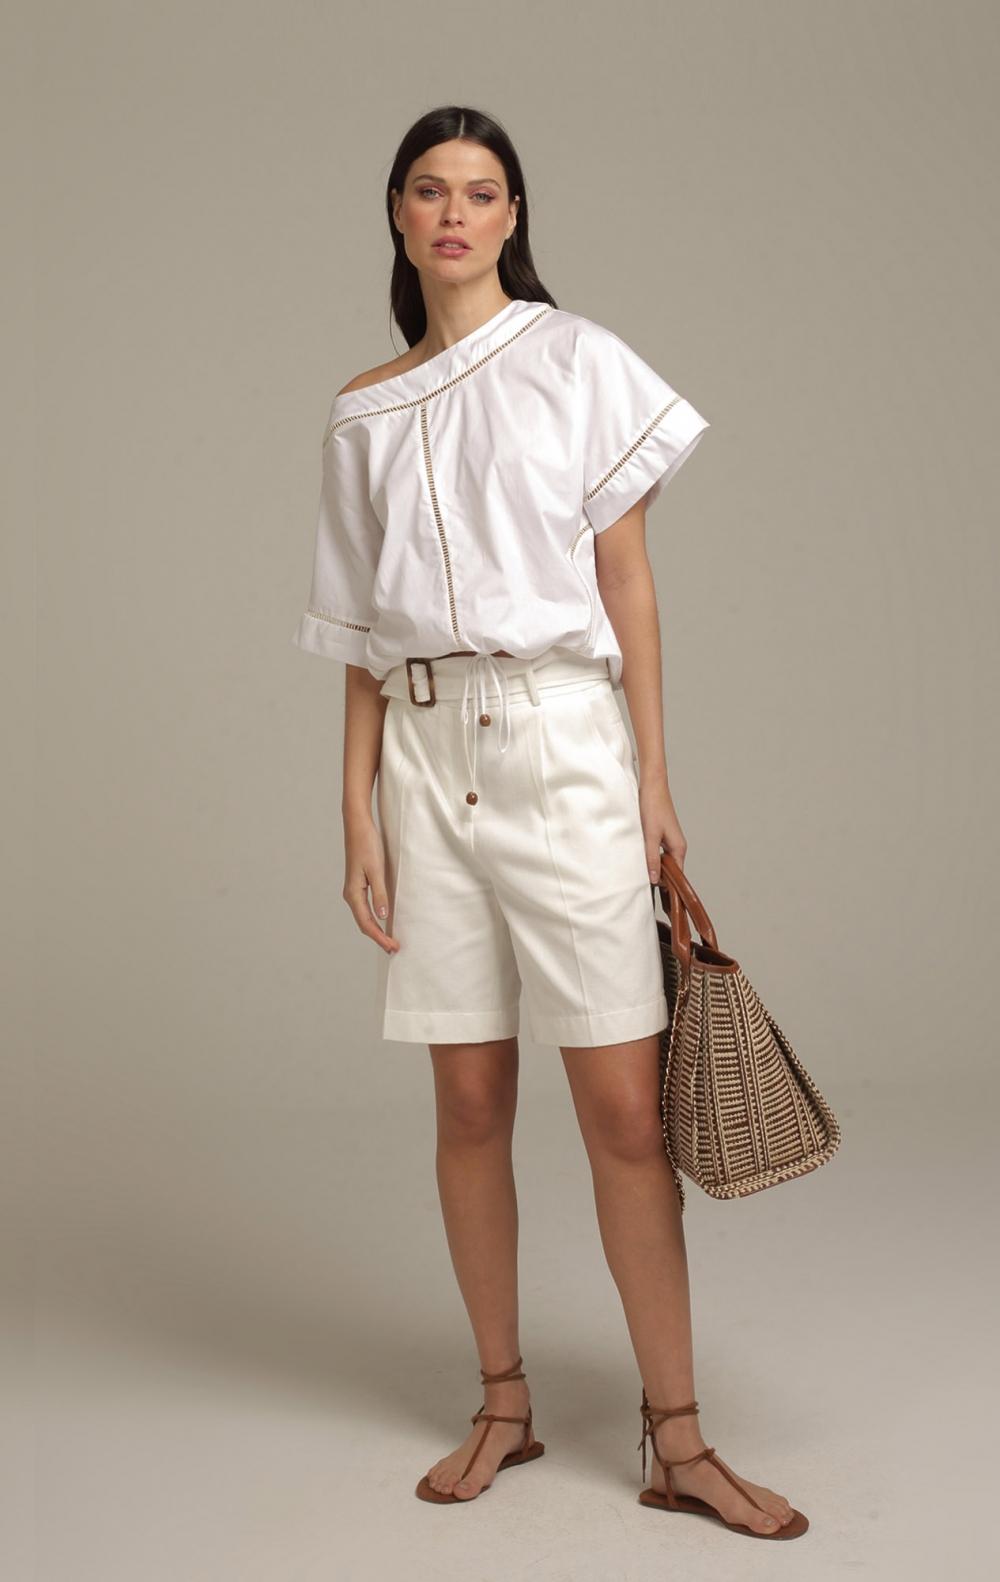 Blusa Joy Branco - Foto 1